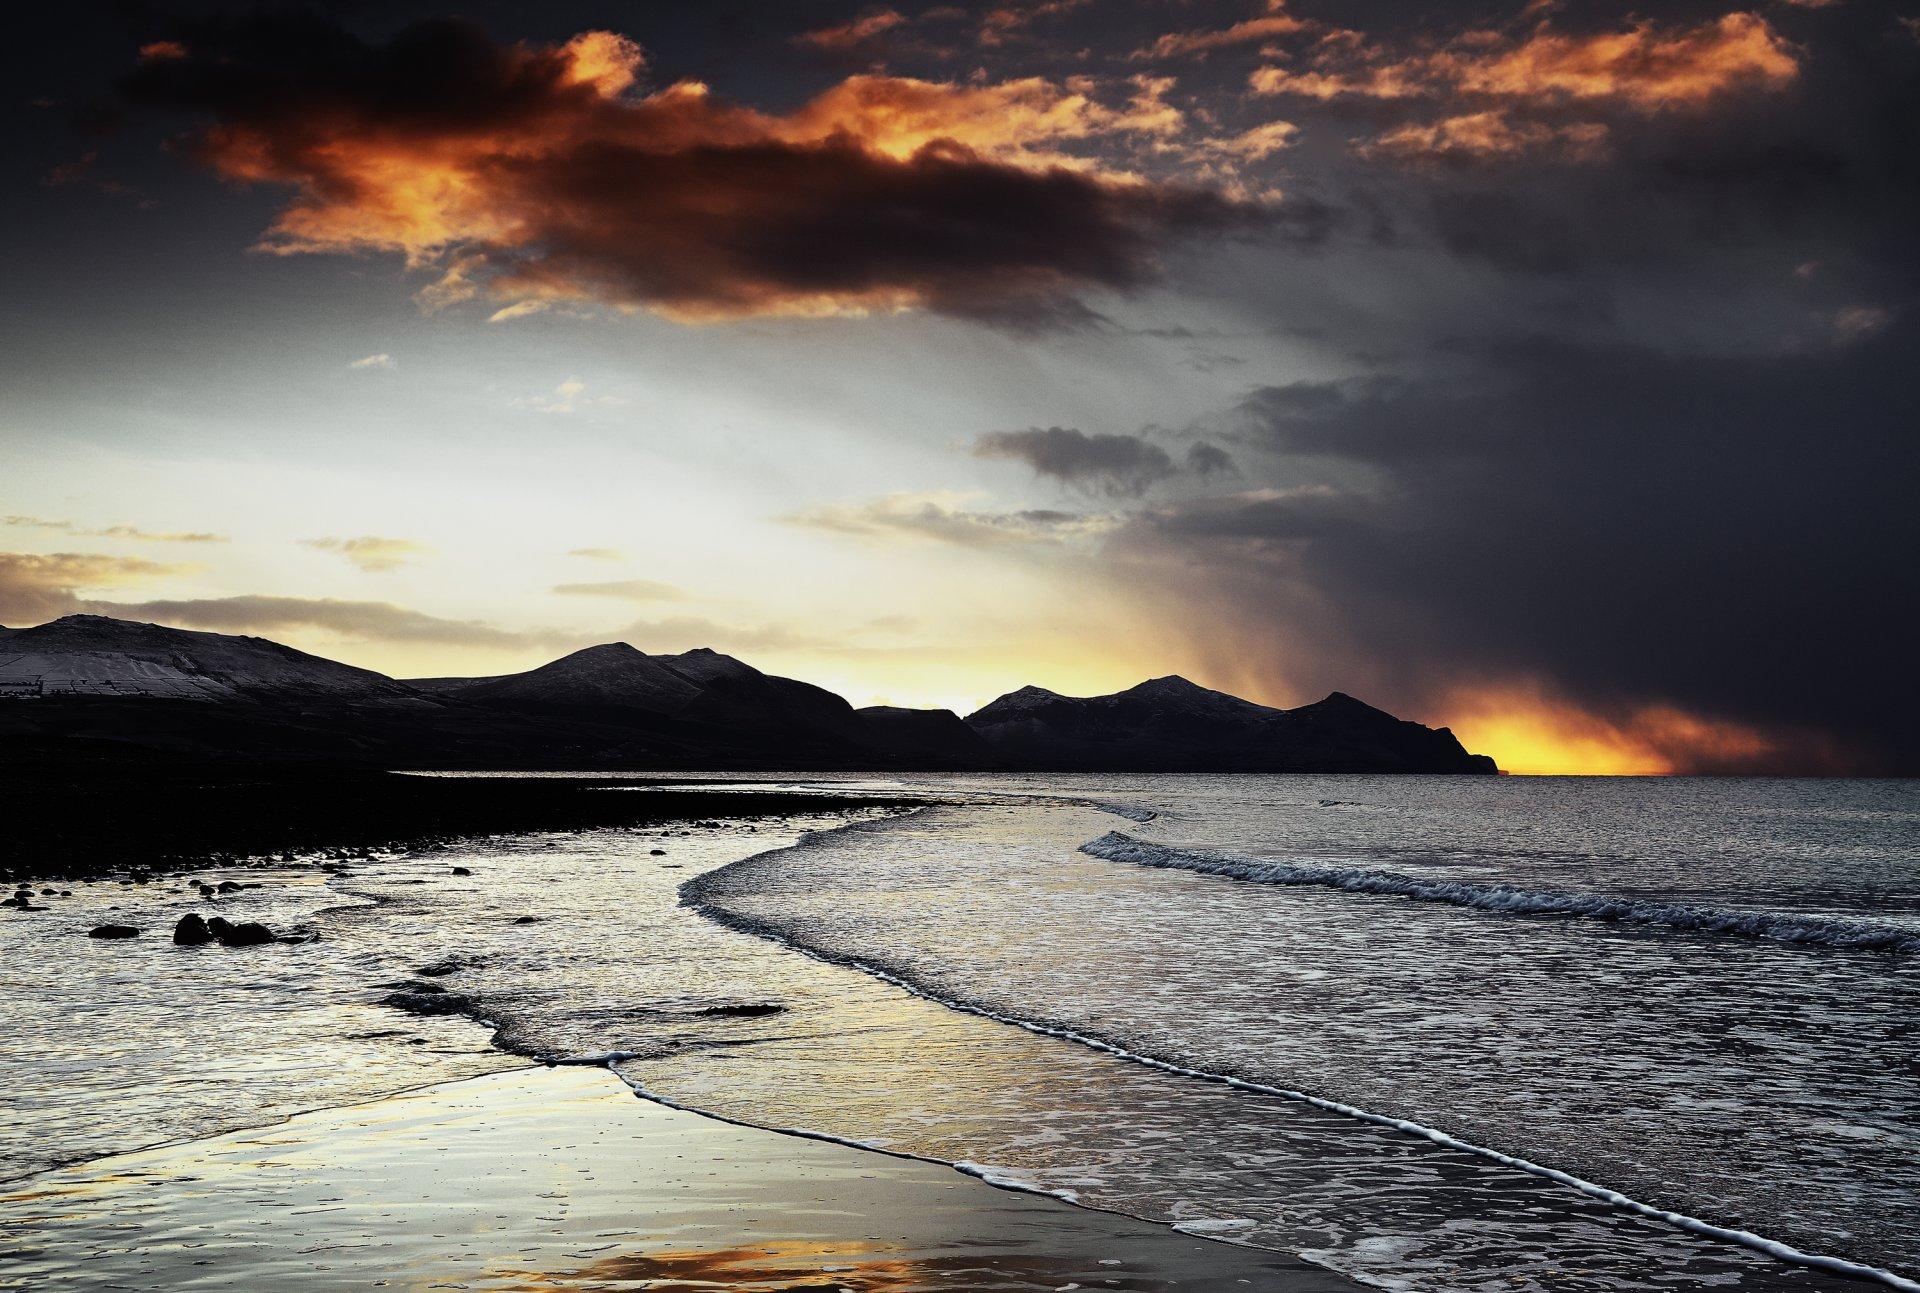 Жизнь, море и горы картинки